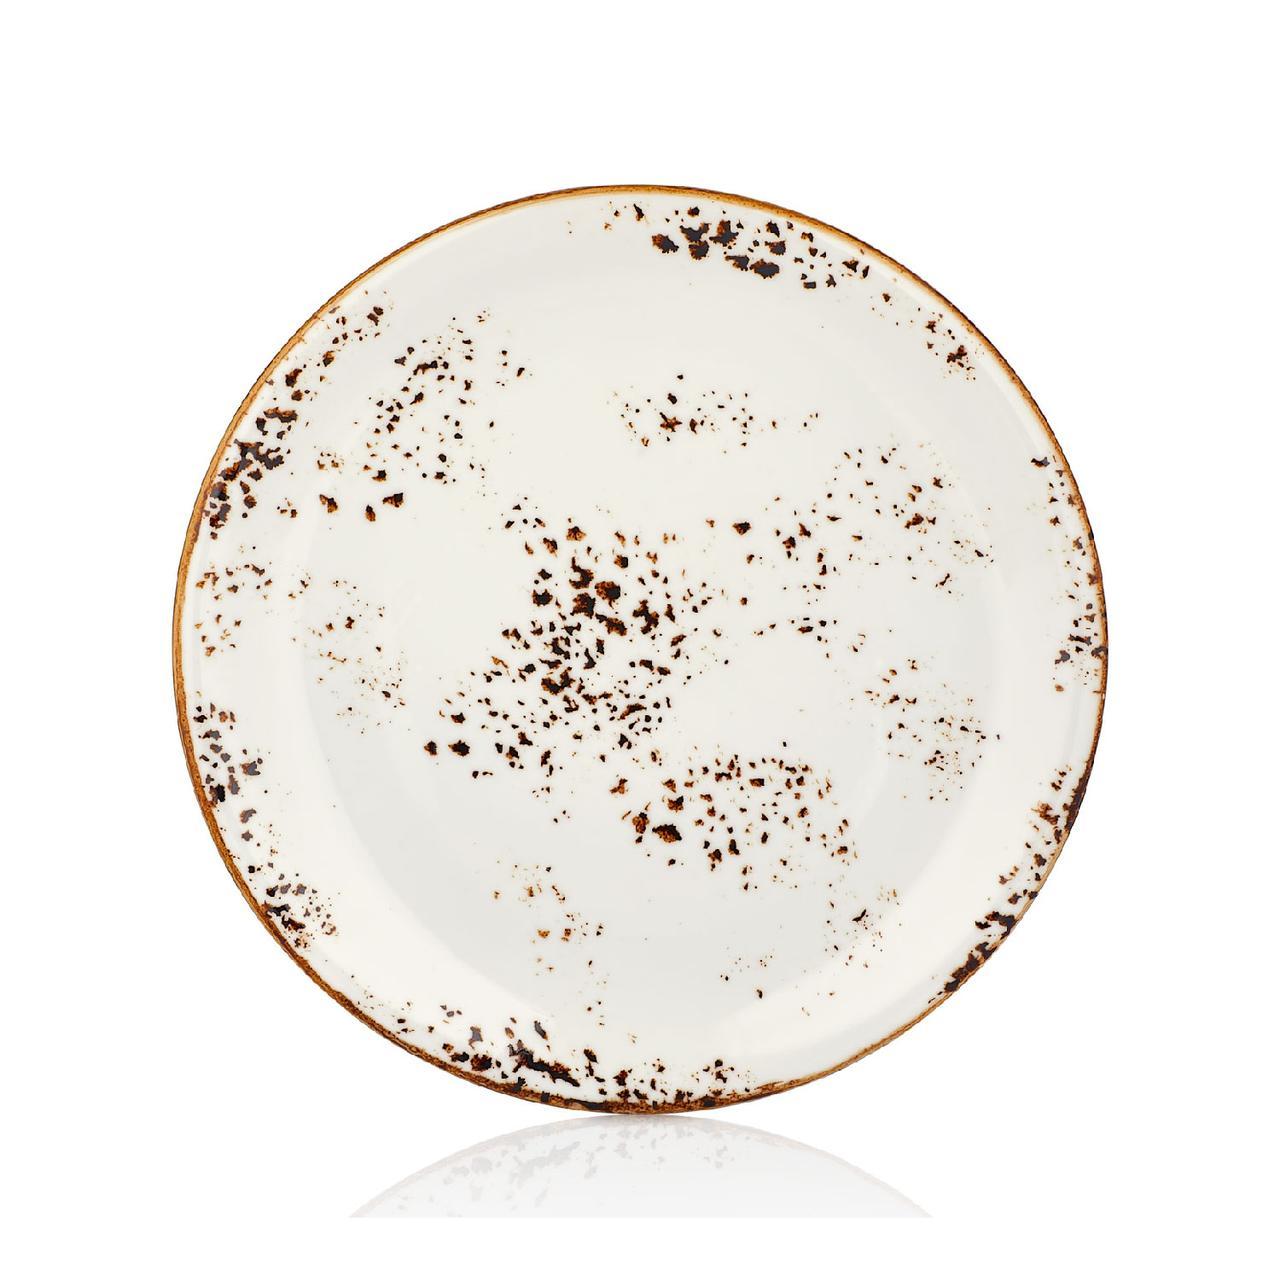 Тарелка обеденная By Bone Elegance 23 см